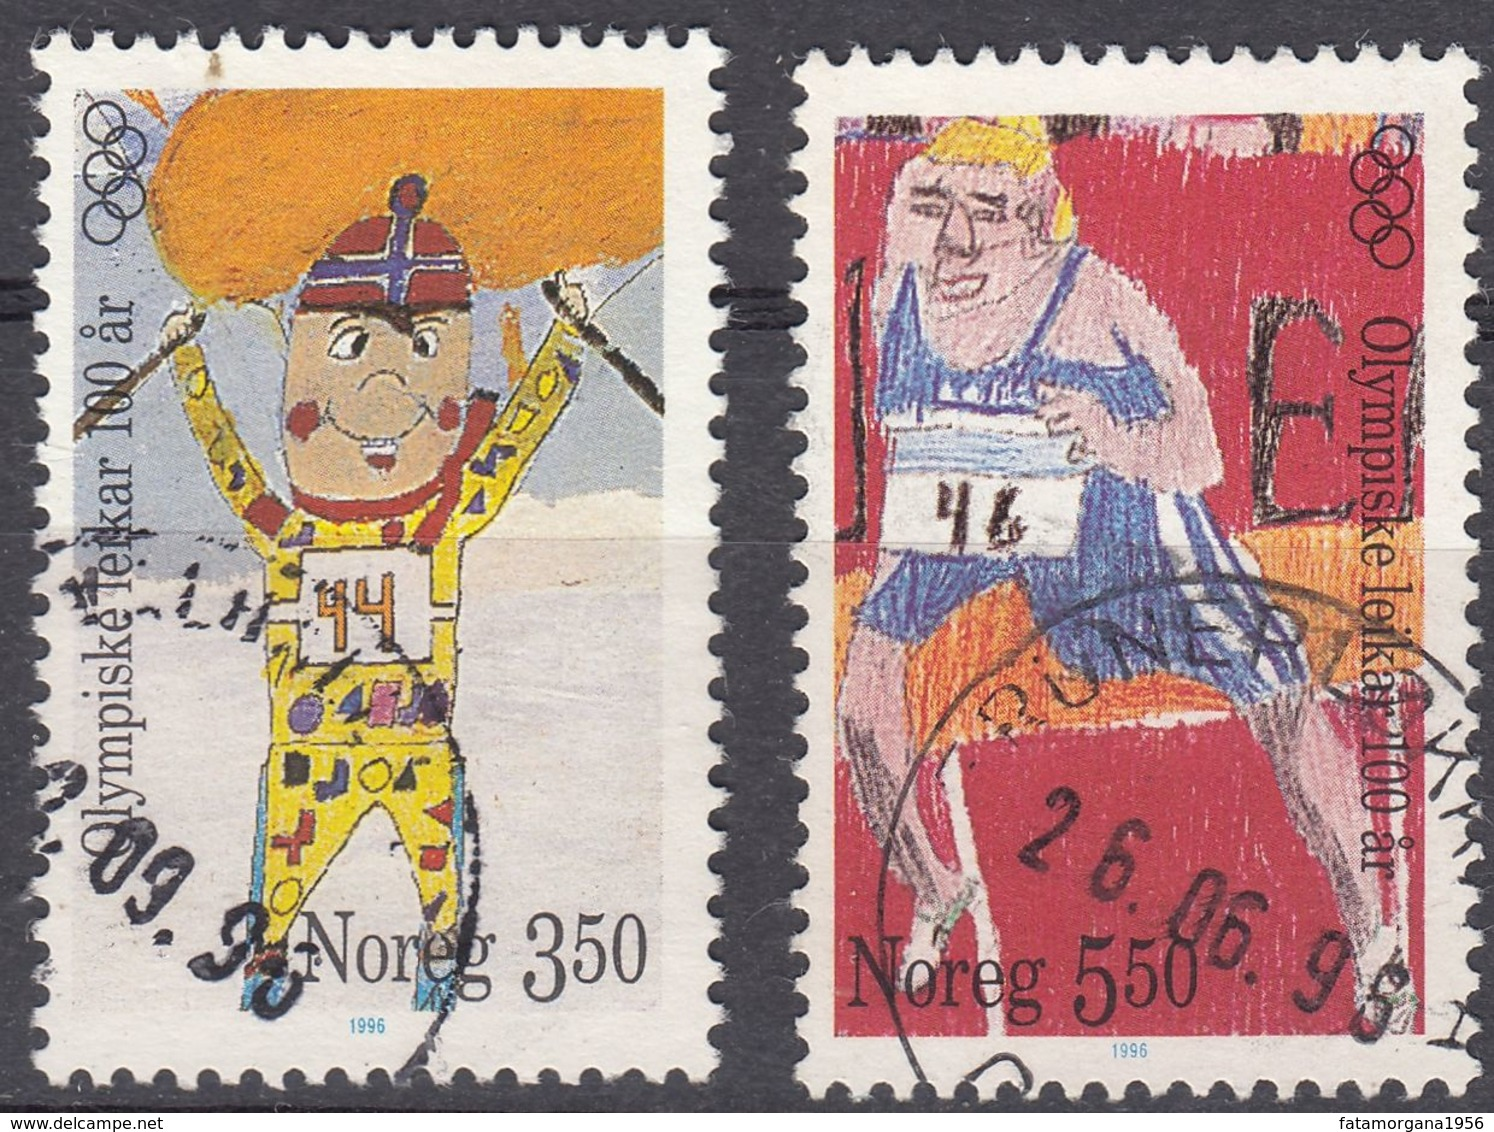 NORGE - 1996 - Serie Completa Di 2 Valori Usati: Yvert 1166/1167, Come Da Immagine. - Gebraucht